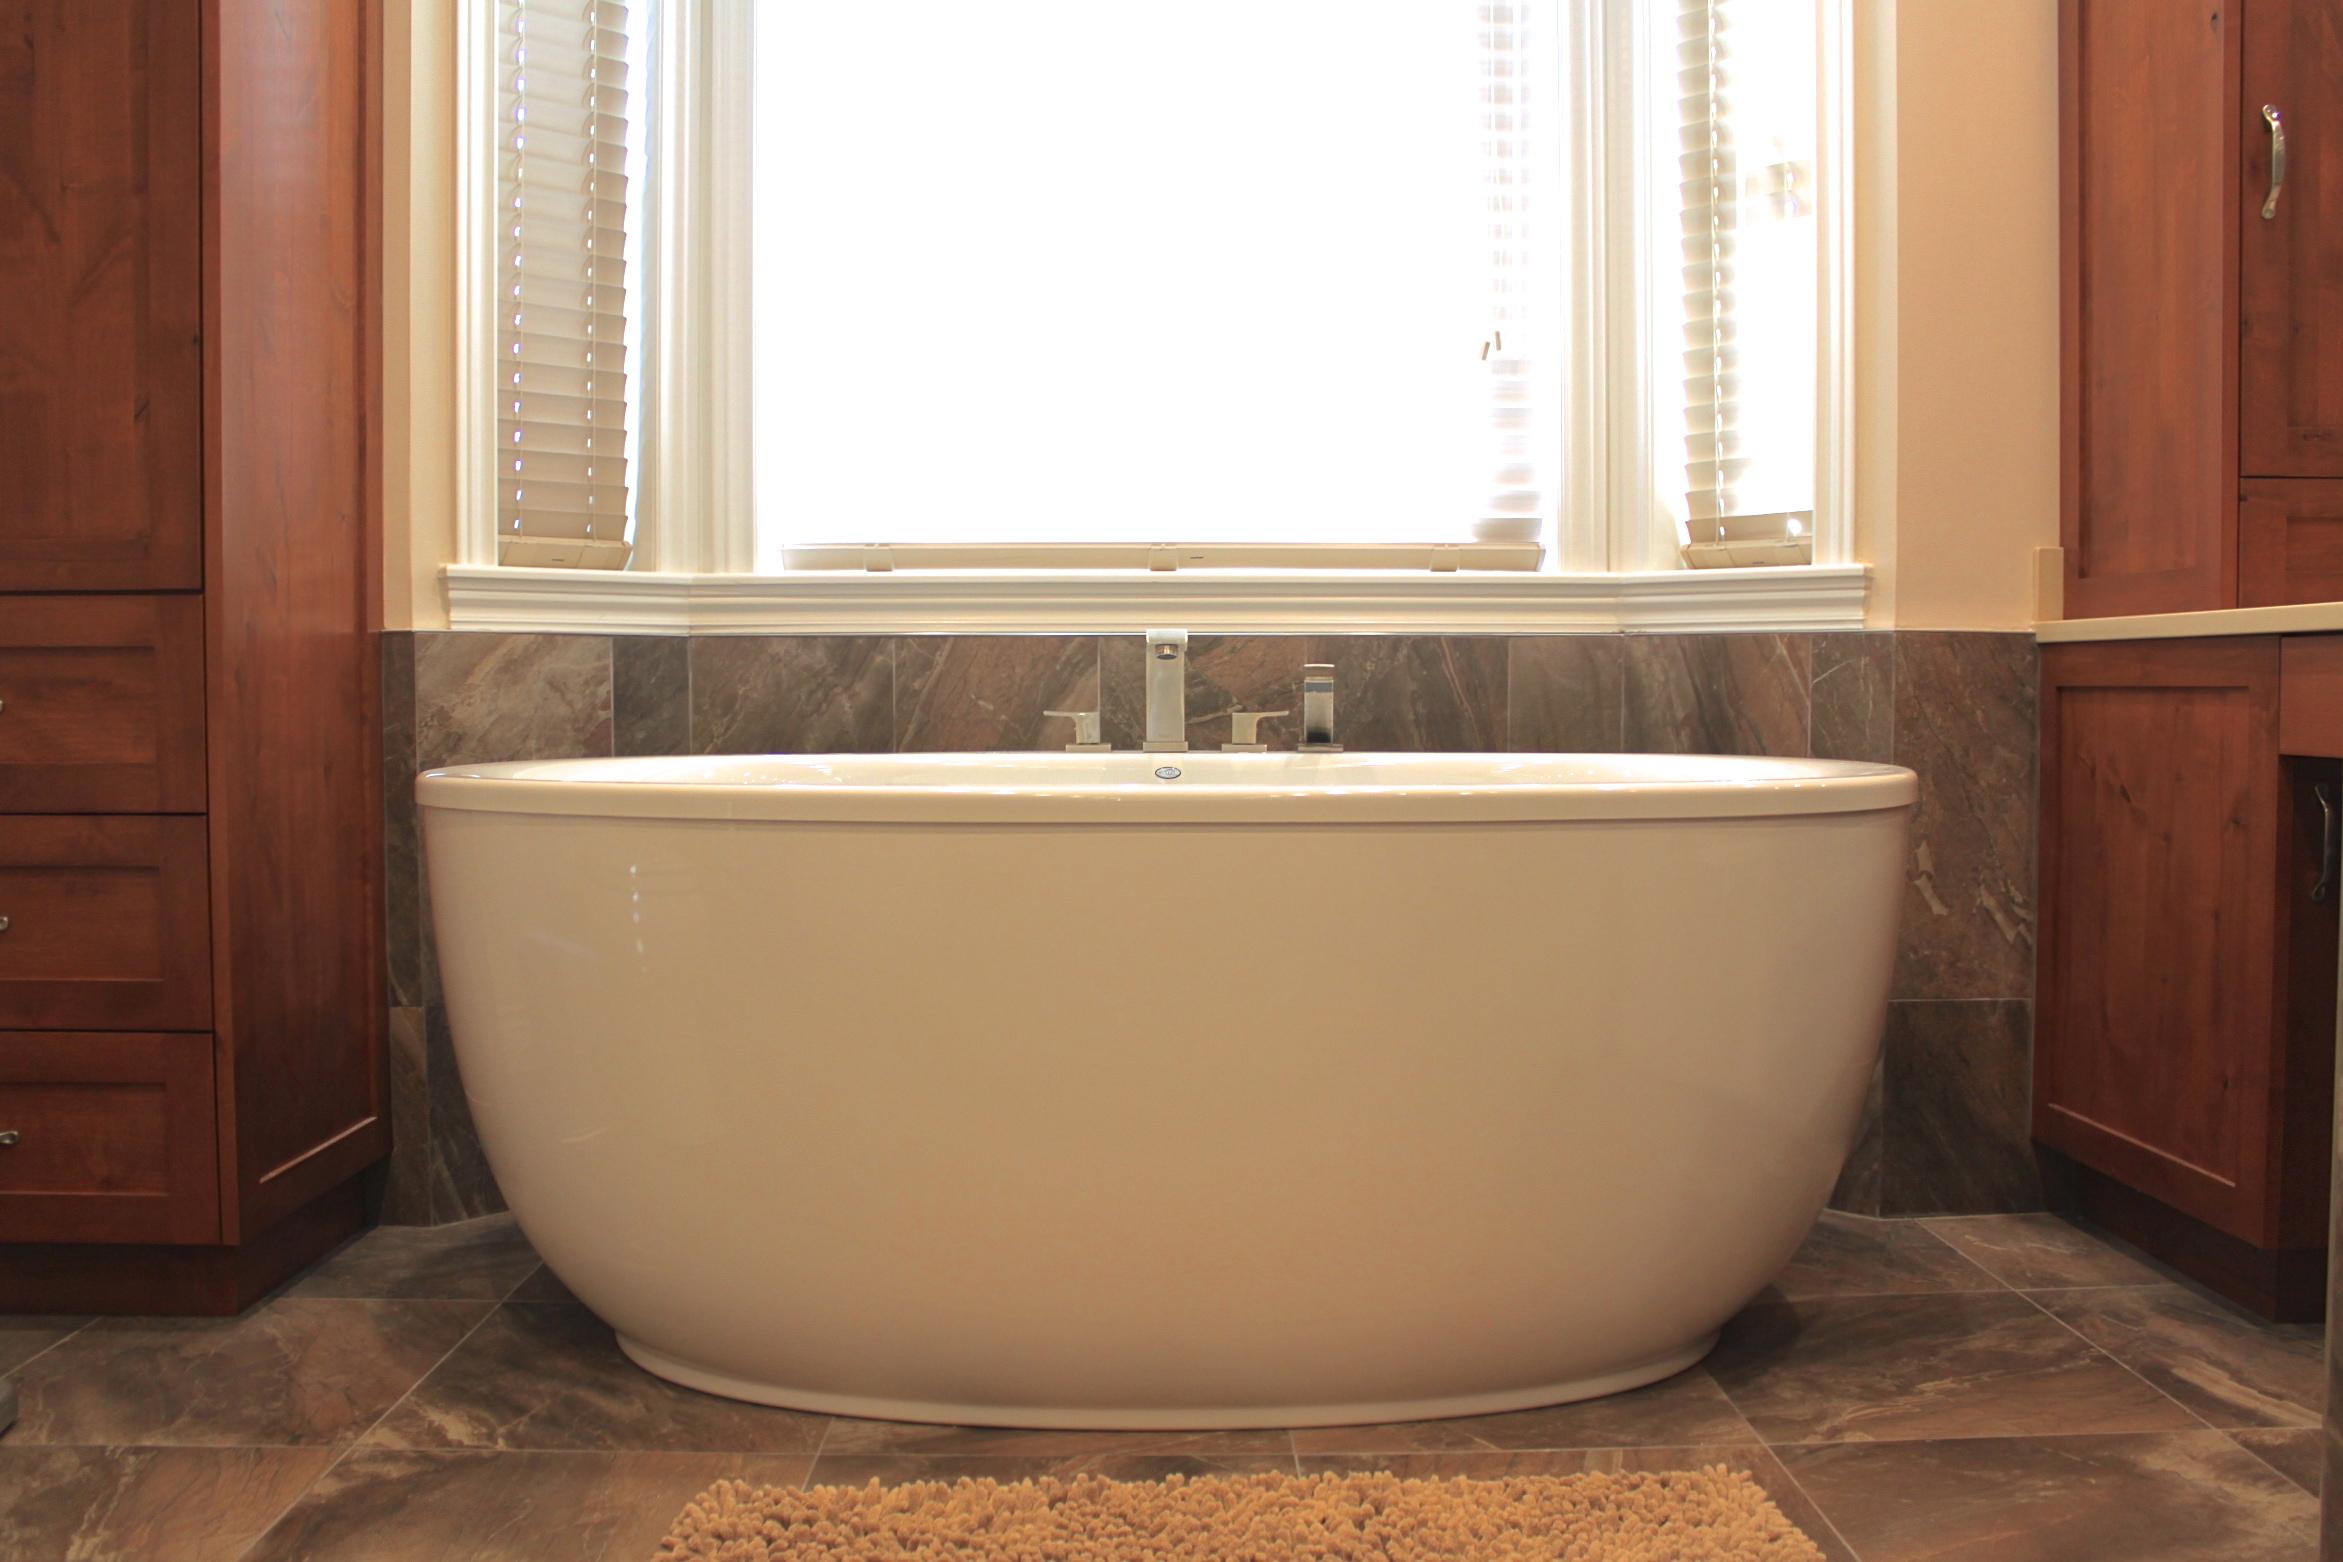 Bathroom Renovations Langley Bc - Bathroom renovations in langley bc